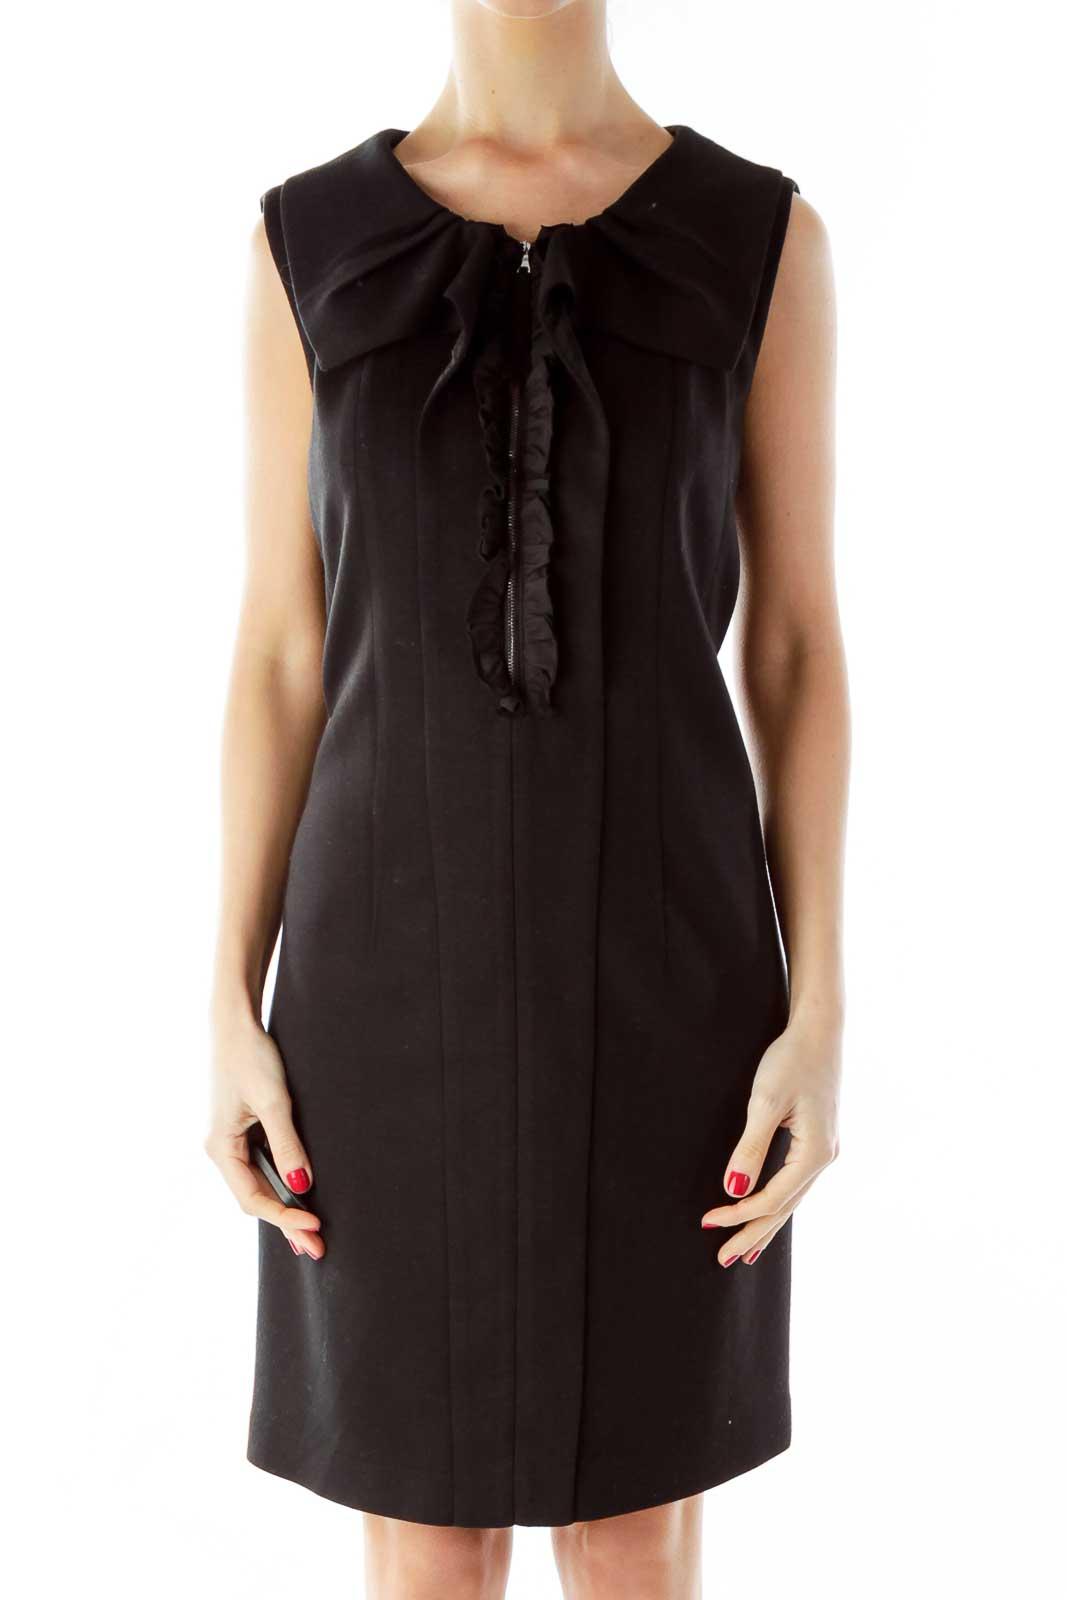 Black Ruffled Zippered Sleeveless Dress Front